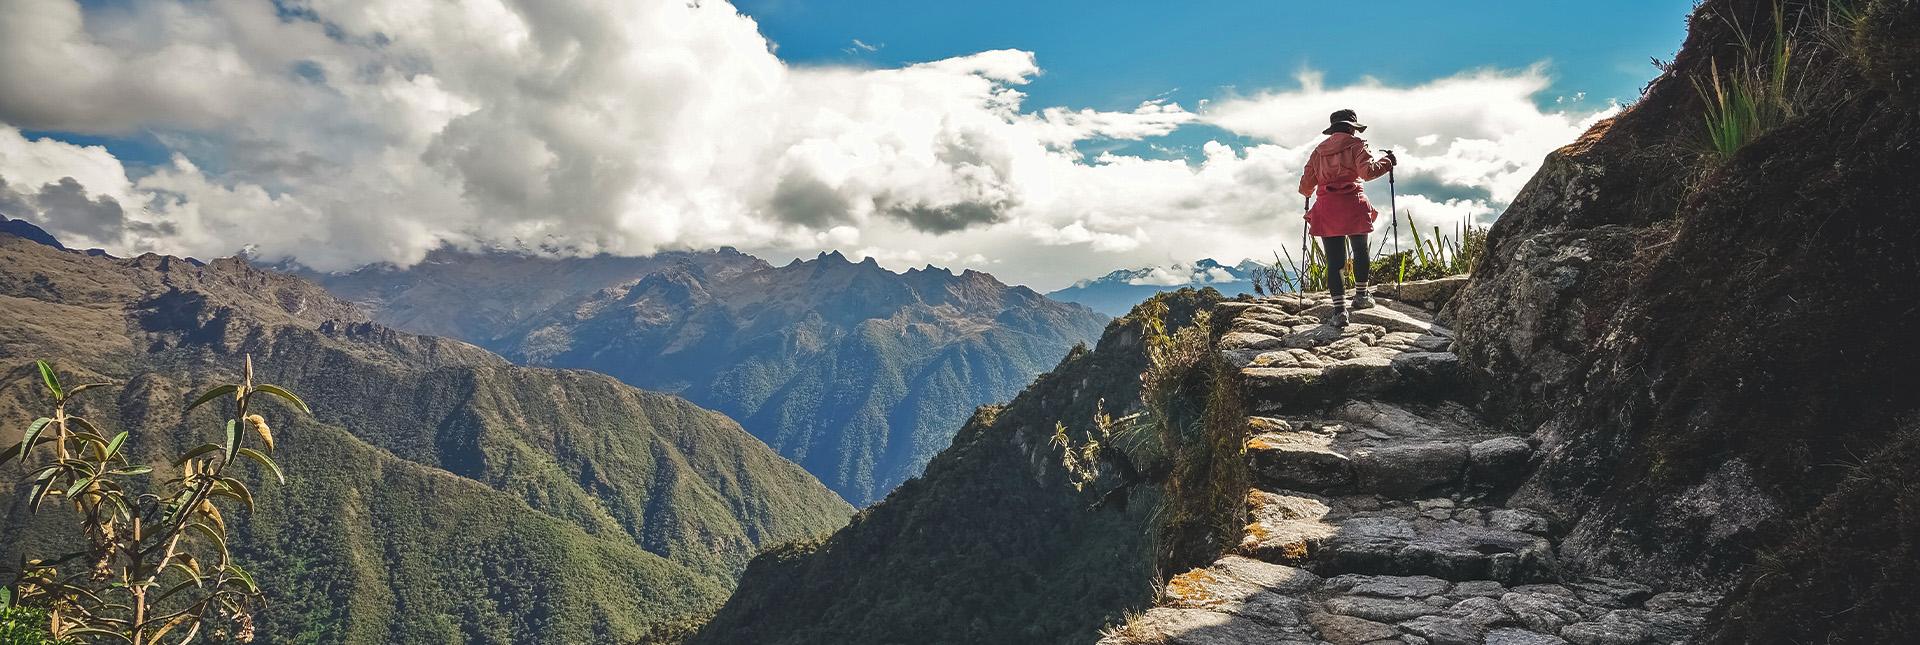 View during the Inca trail trek